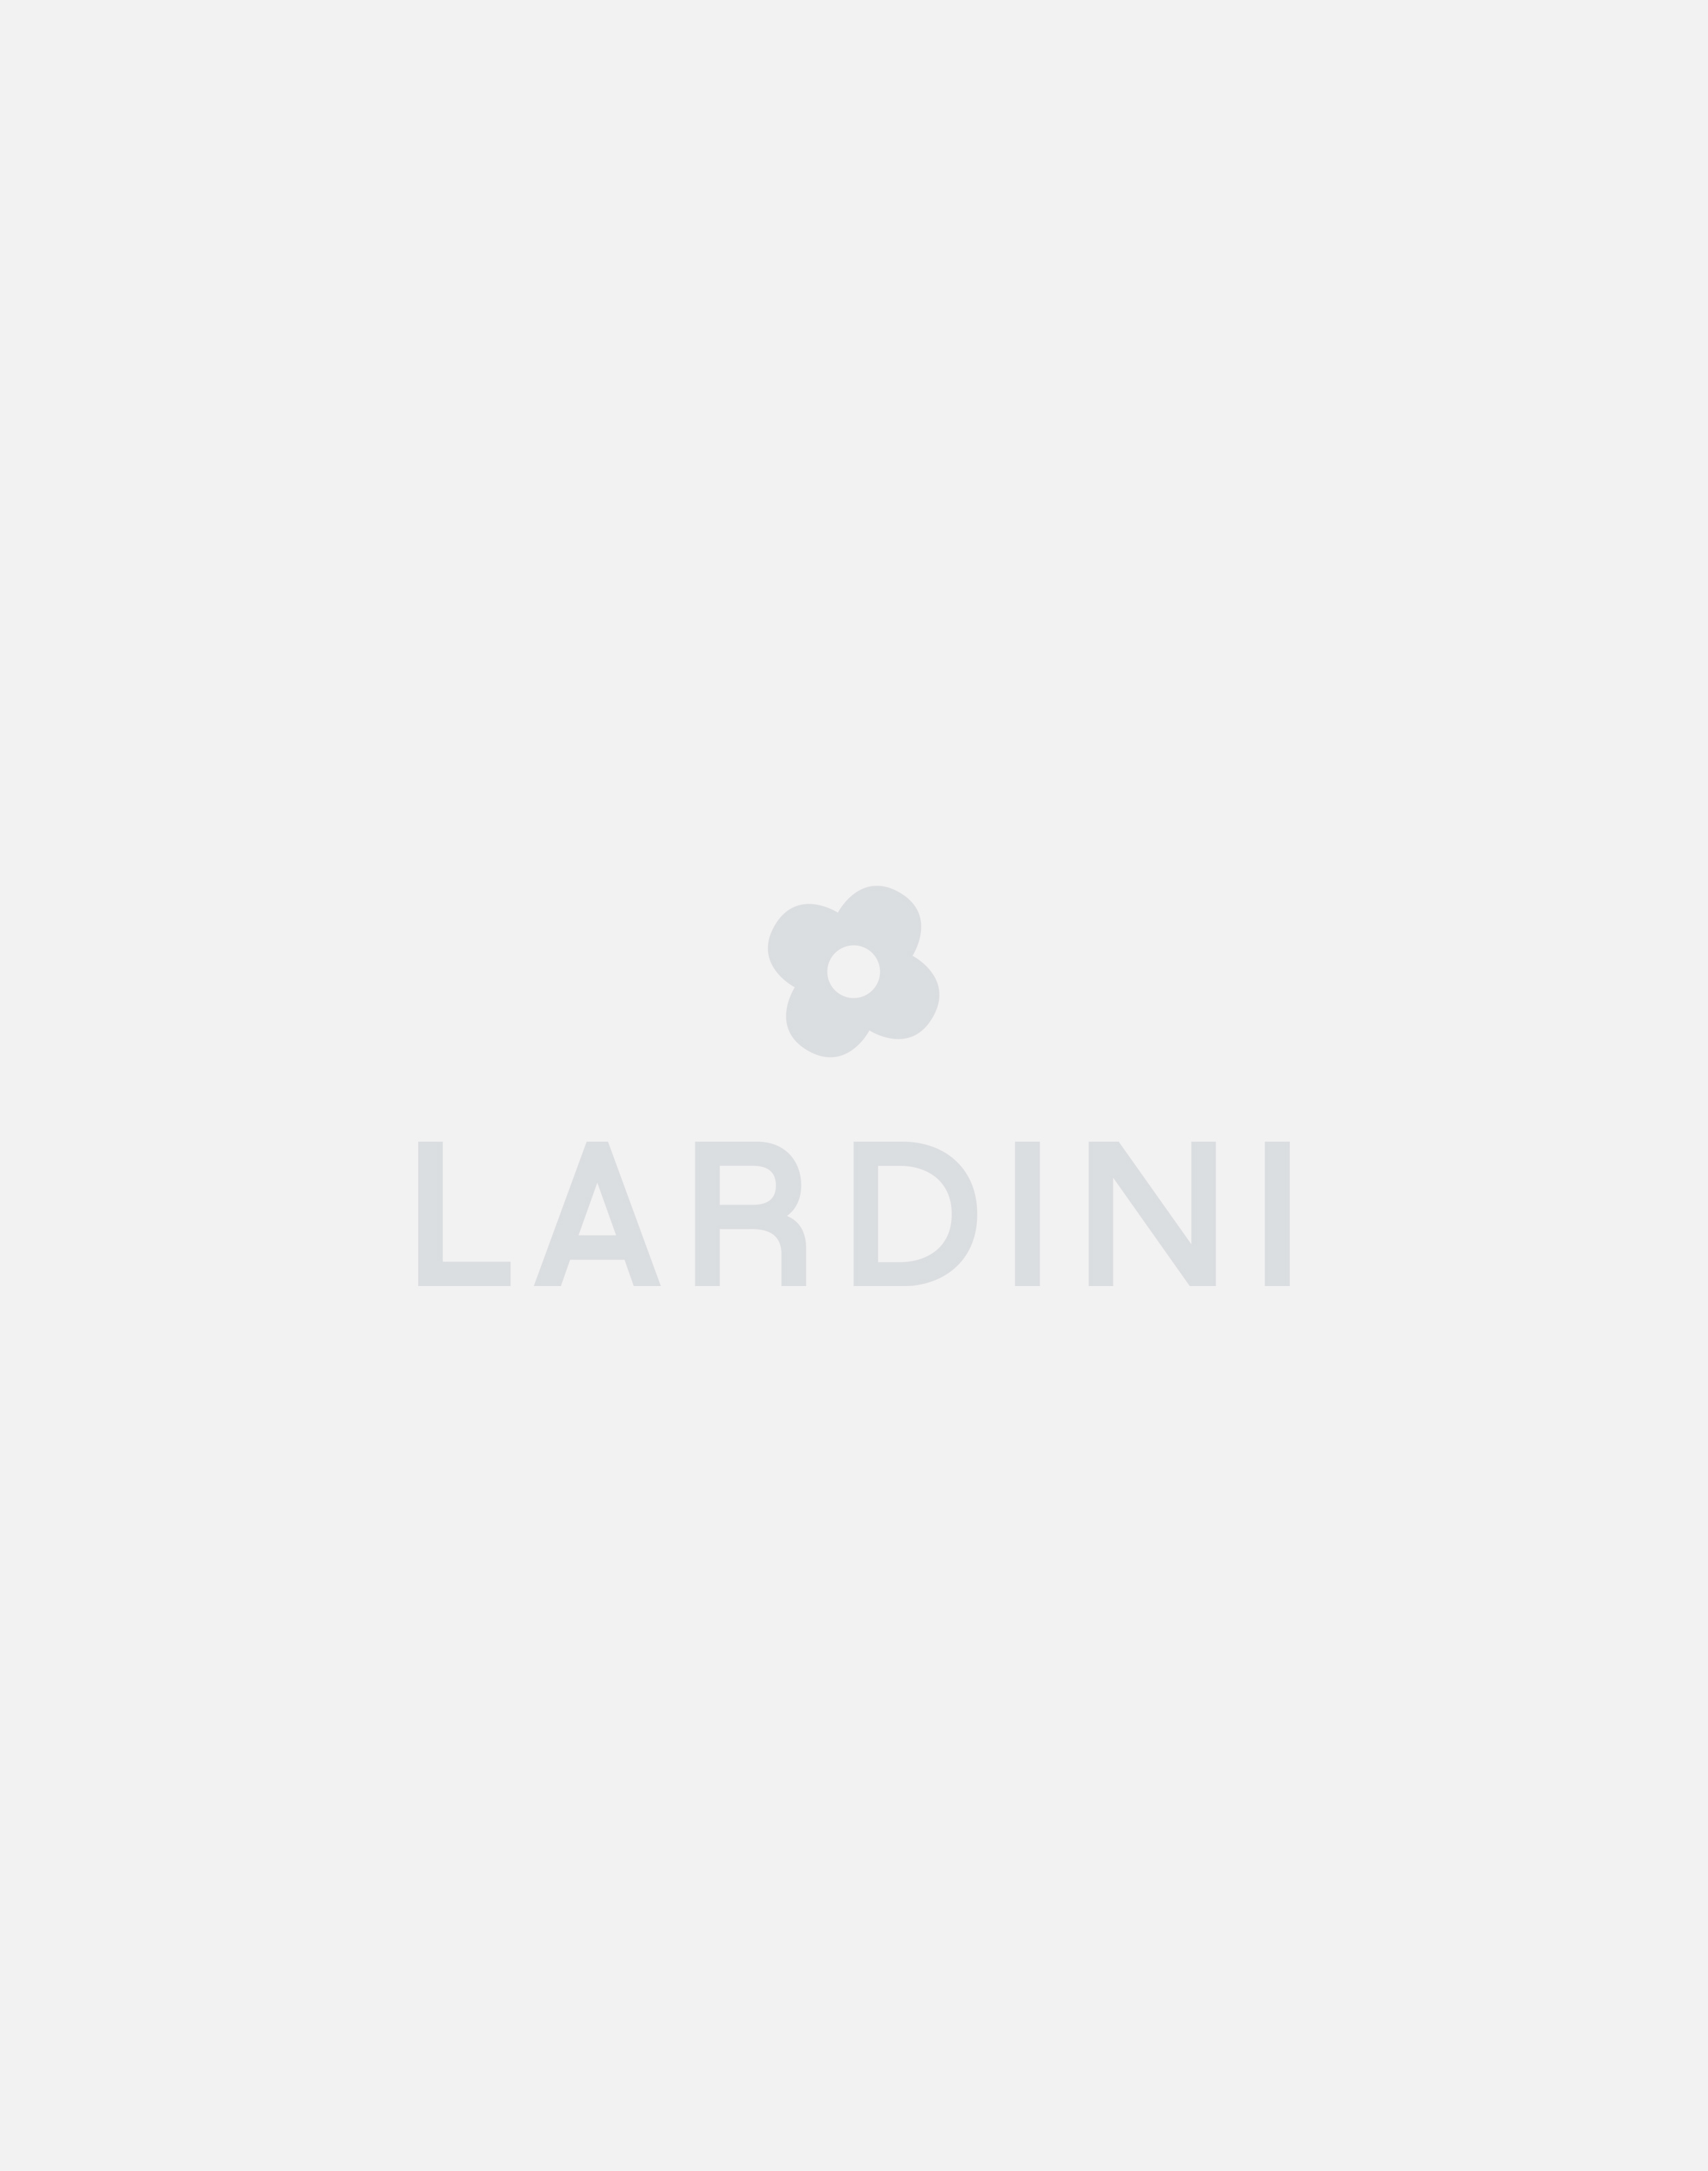 Beige wool trousers without belt loops